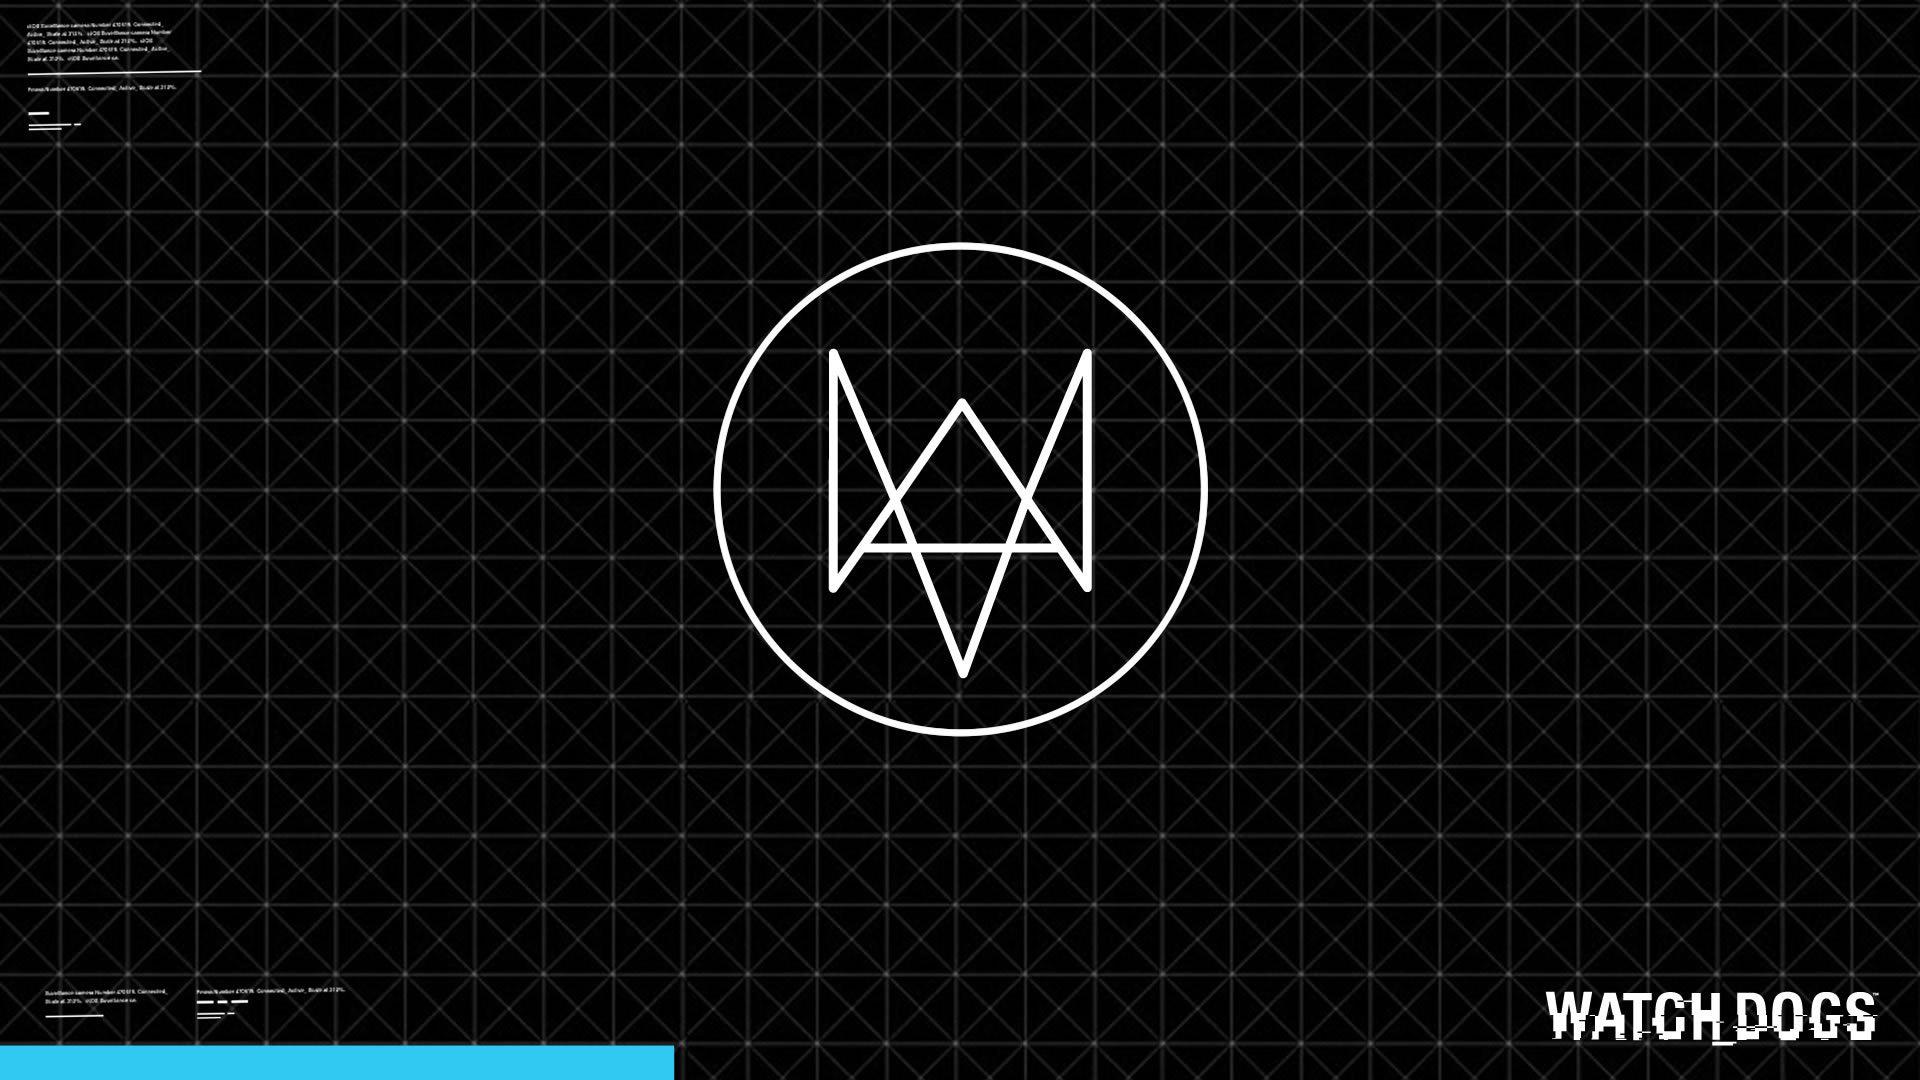 49 Watch Dogs Logo Wallpaper On Wallpapersafari